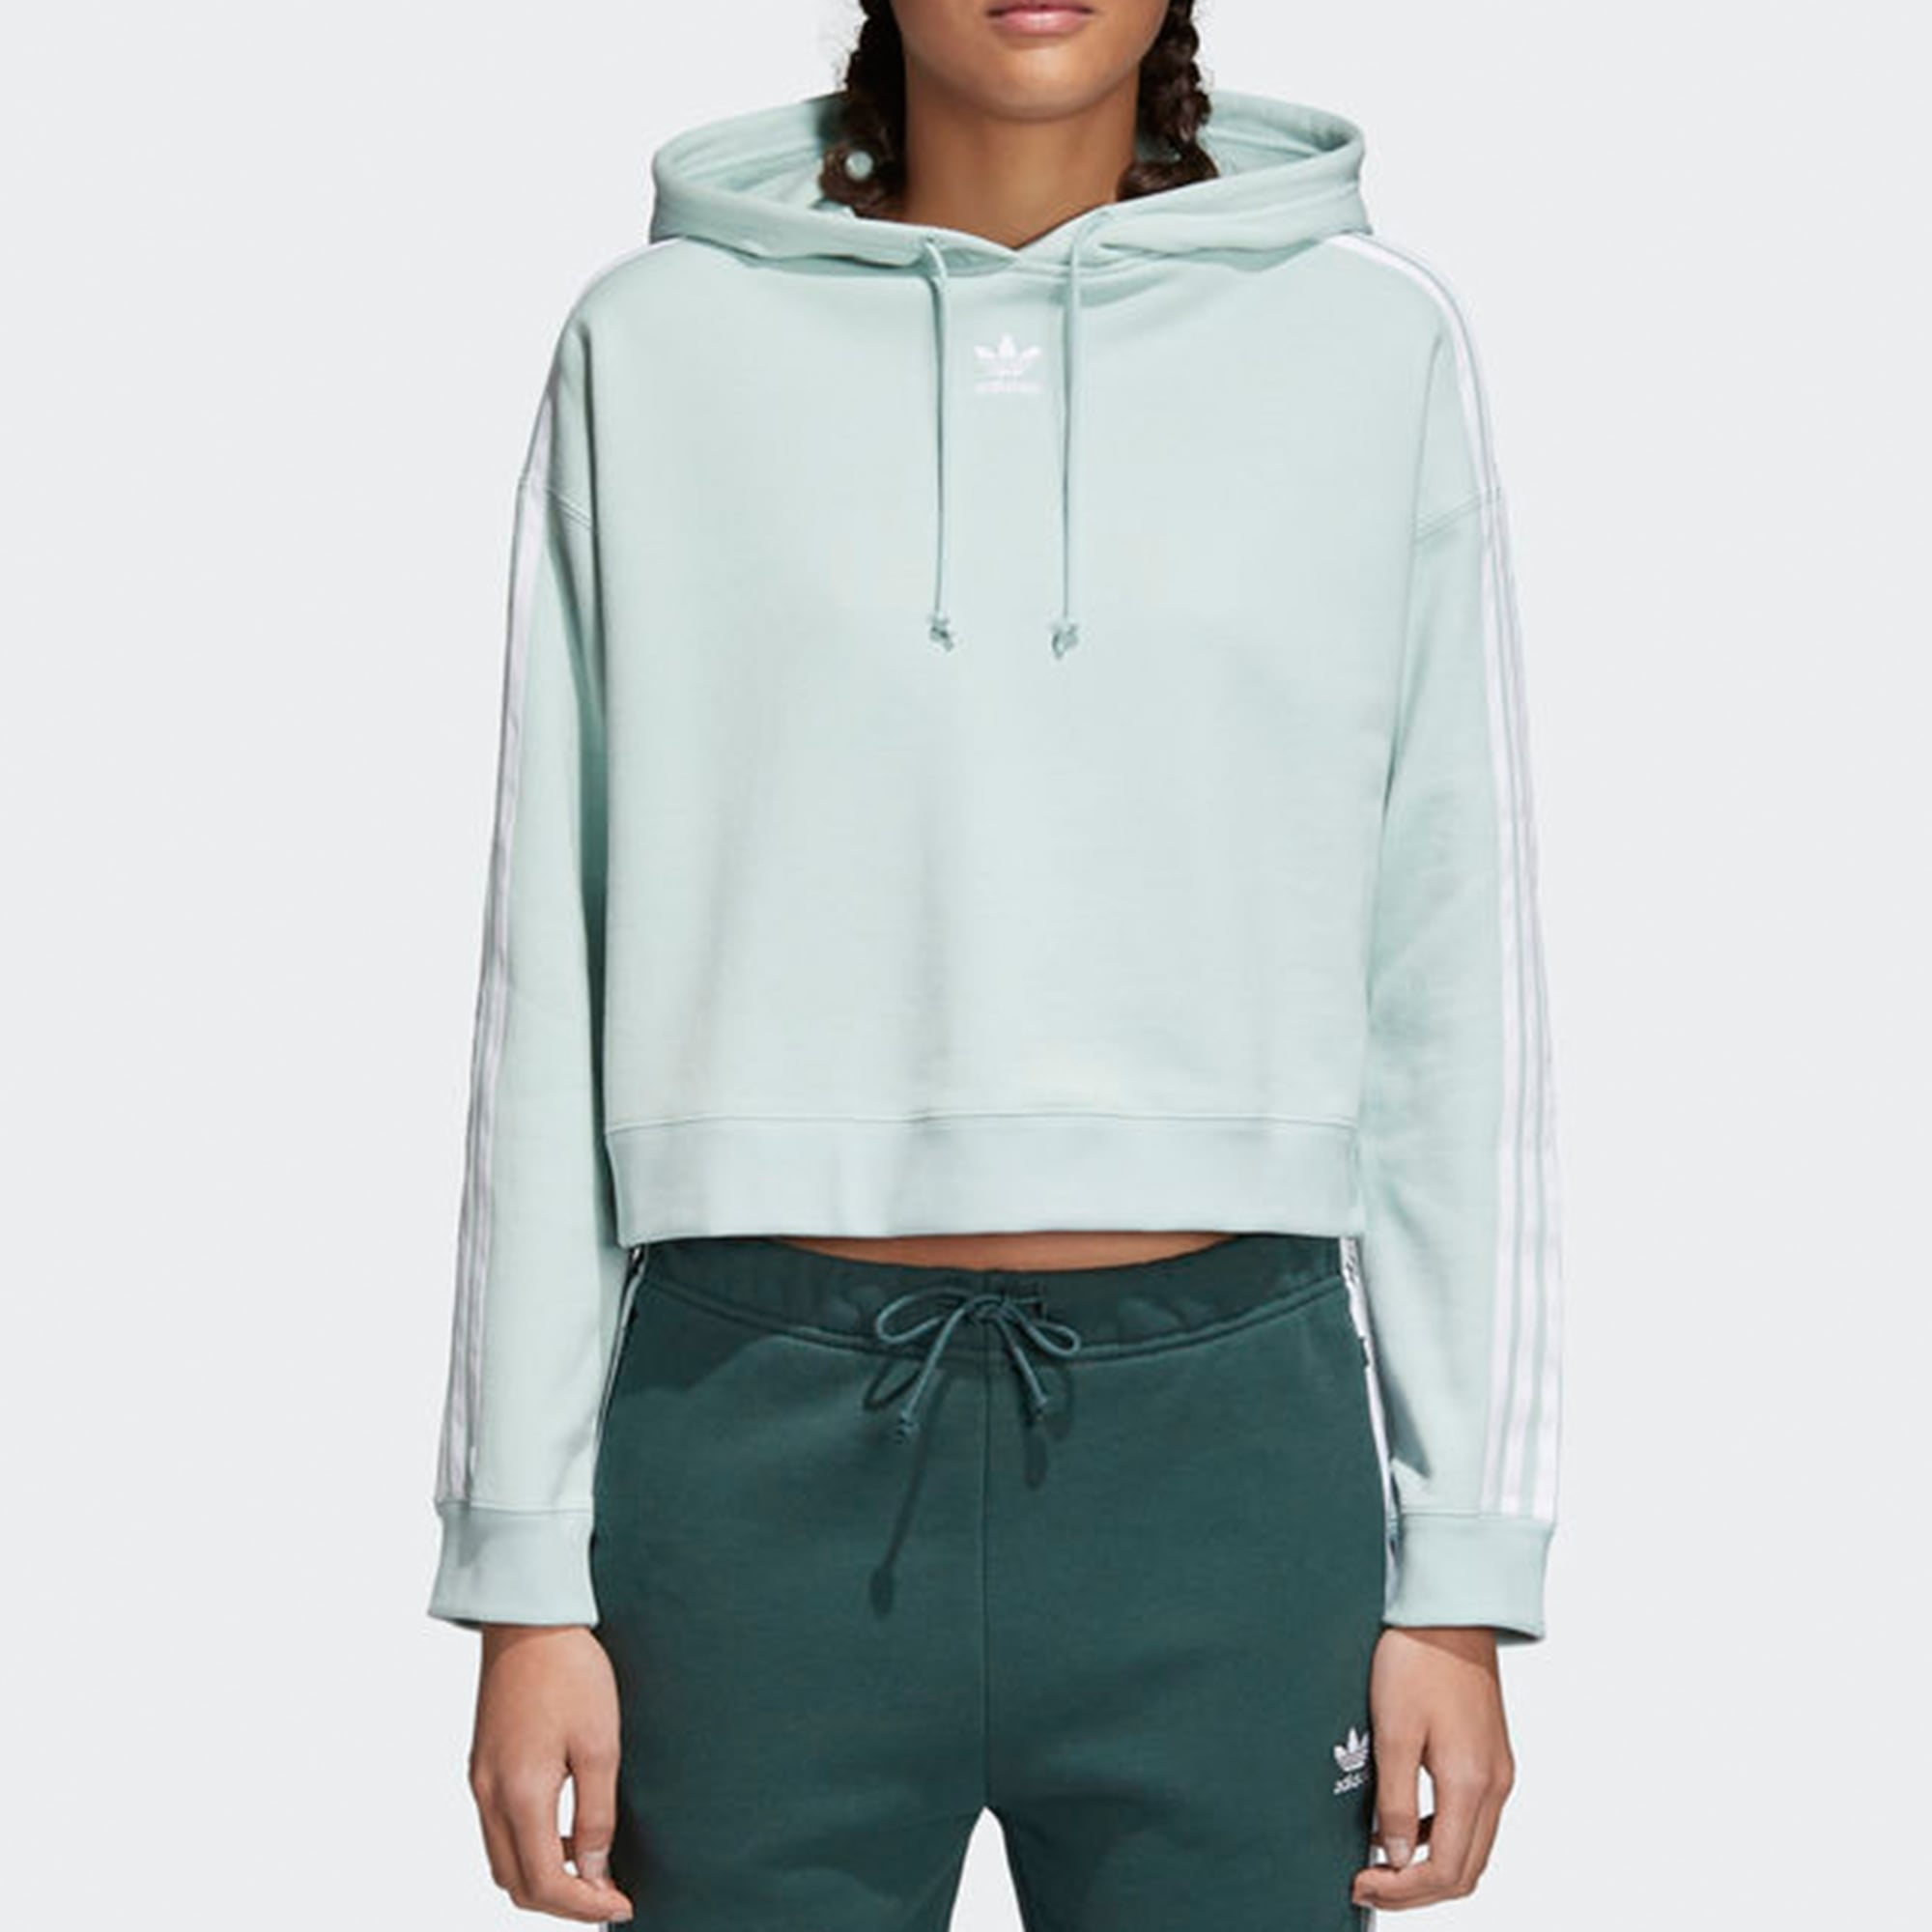 Army Green Cropped Women Hoodies Sweatshirt Drawstring ...  Green Cropped Hoodie